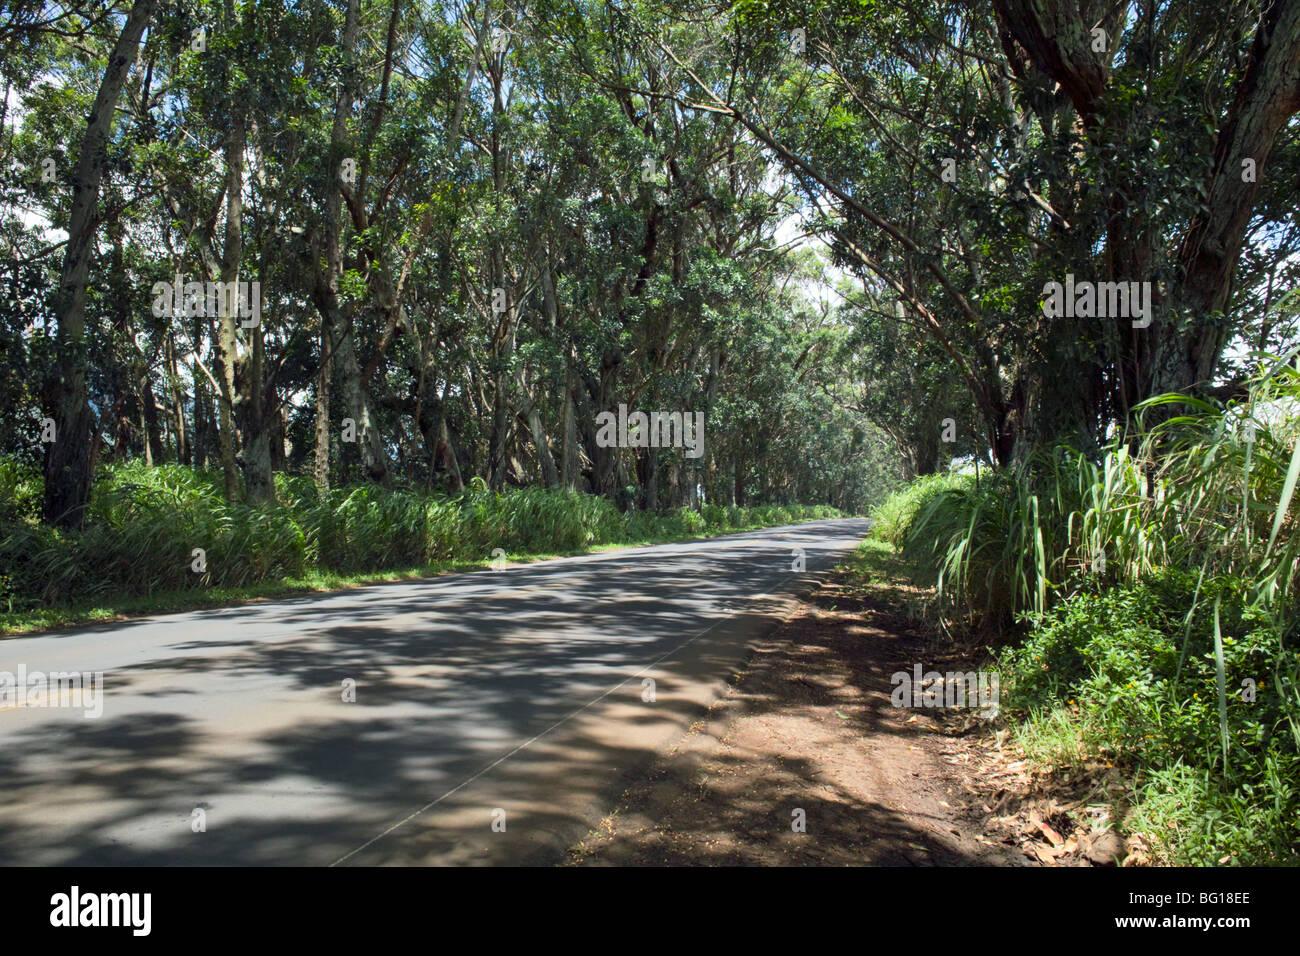 Mahagonibäume  Baum-Tunnel der Sumpf Mahagoni Bäume Knudsen Lücke Kauai HI ...